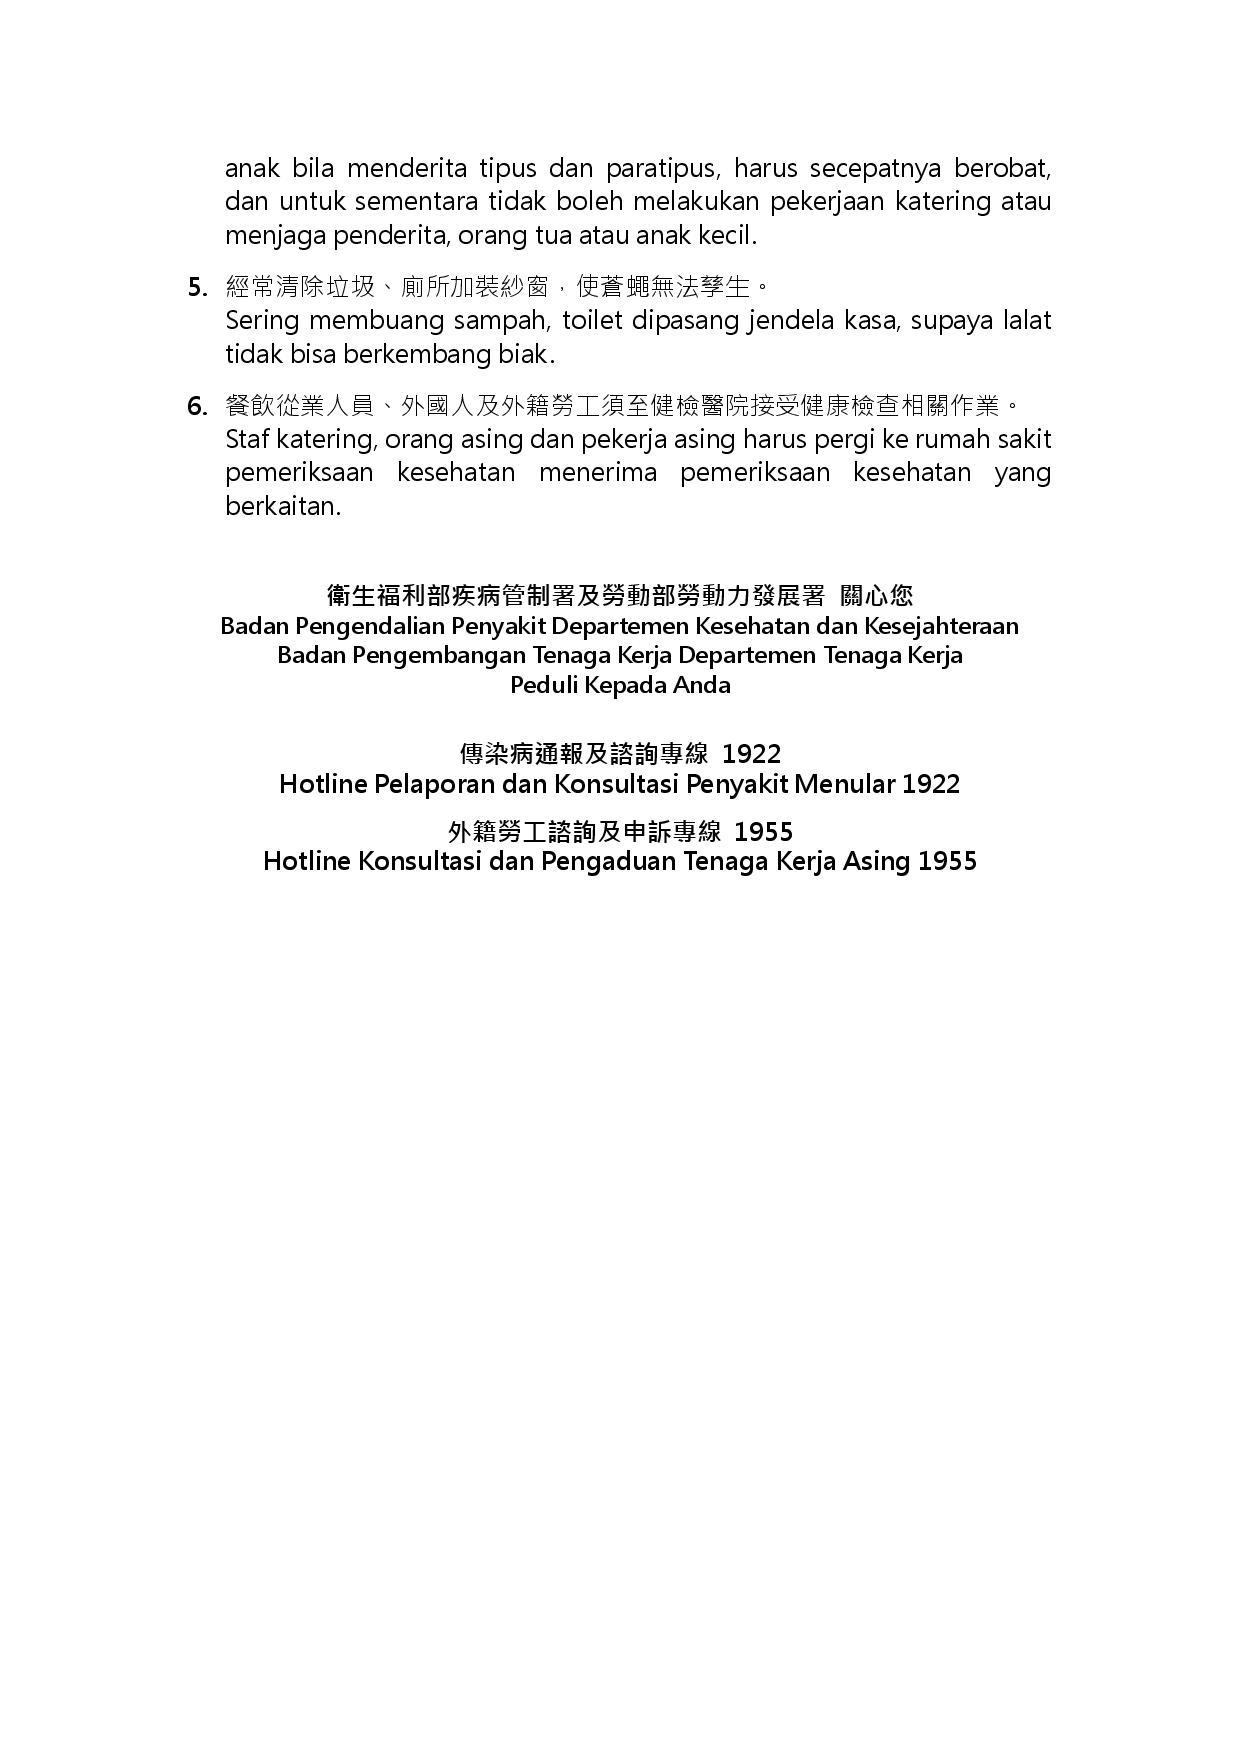 詳如附件【Klik】Mencegah Tipus dan Paratipus(Halaman 3)預防傷寒及副傷寒(印尼文)